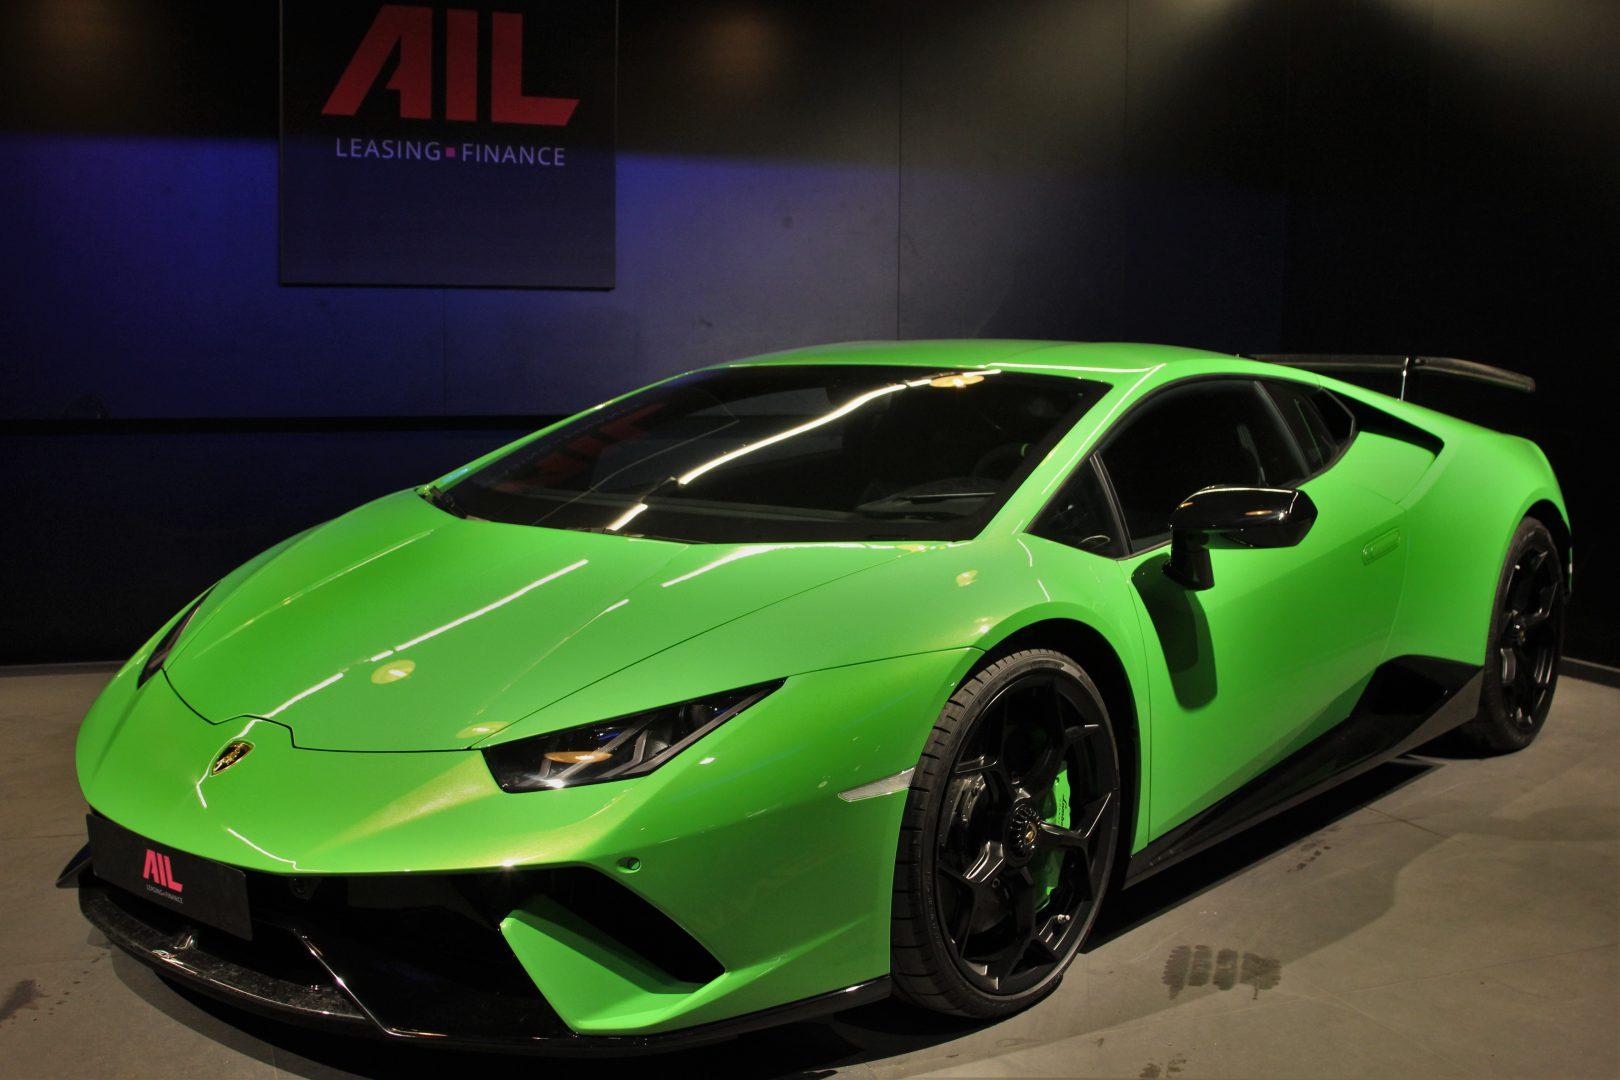 AIL Lamborghini Huracan Performante LP 640-4 Style Paket  12